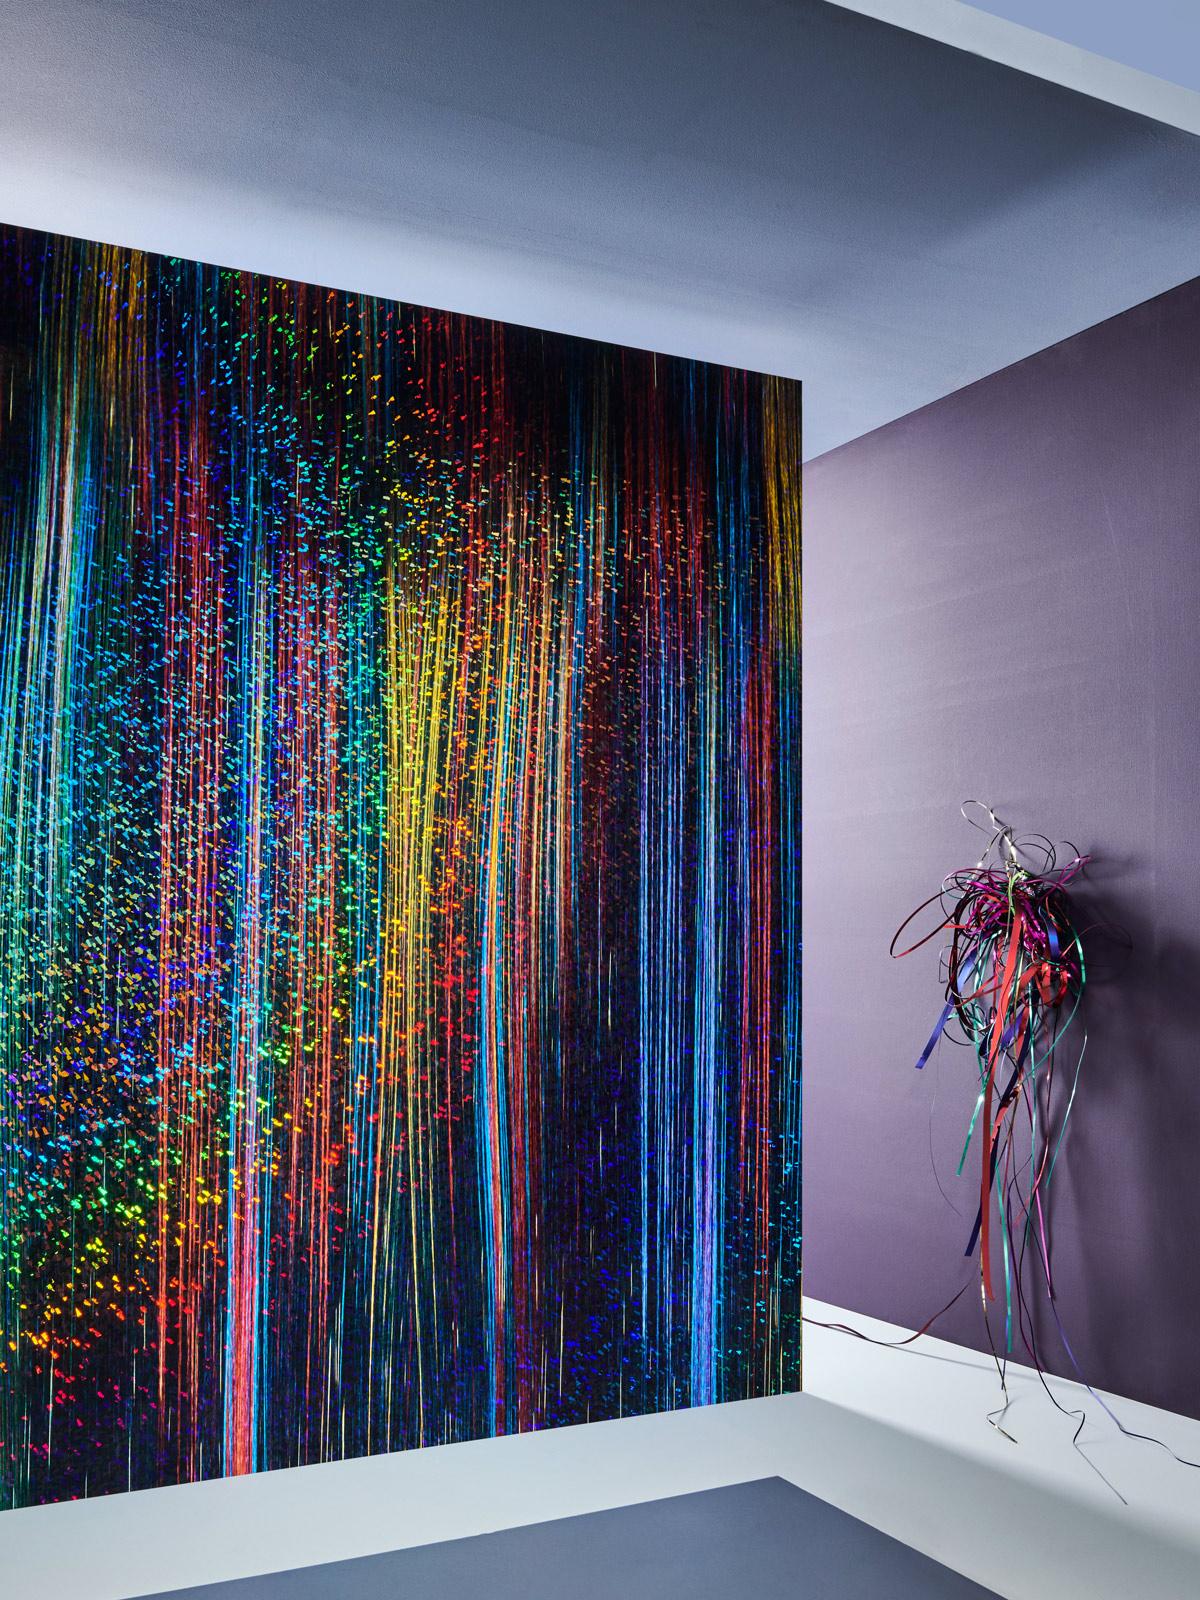 bernhard duss-jakob schlaepfer-wallcoverings-textiledesign-tapeten-designer-custom made wallcovering-inkjetprint-interiorfabrics-interior collection-decoration